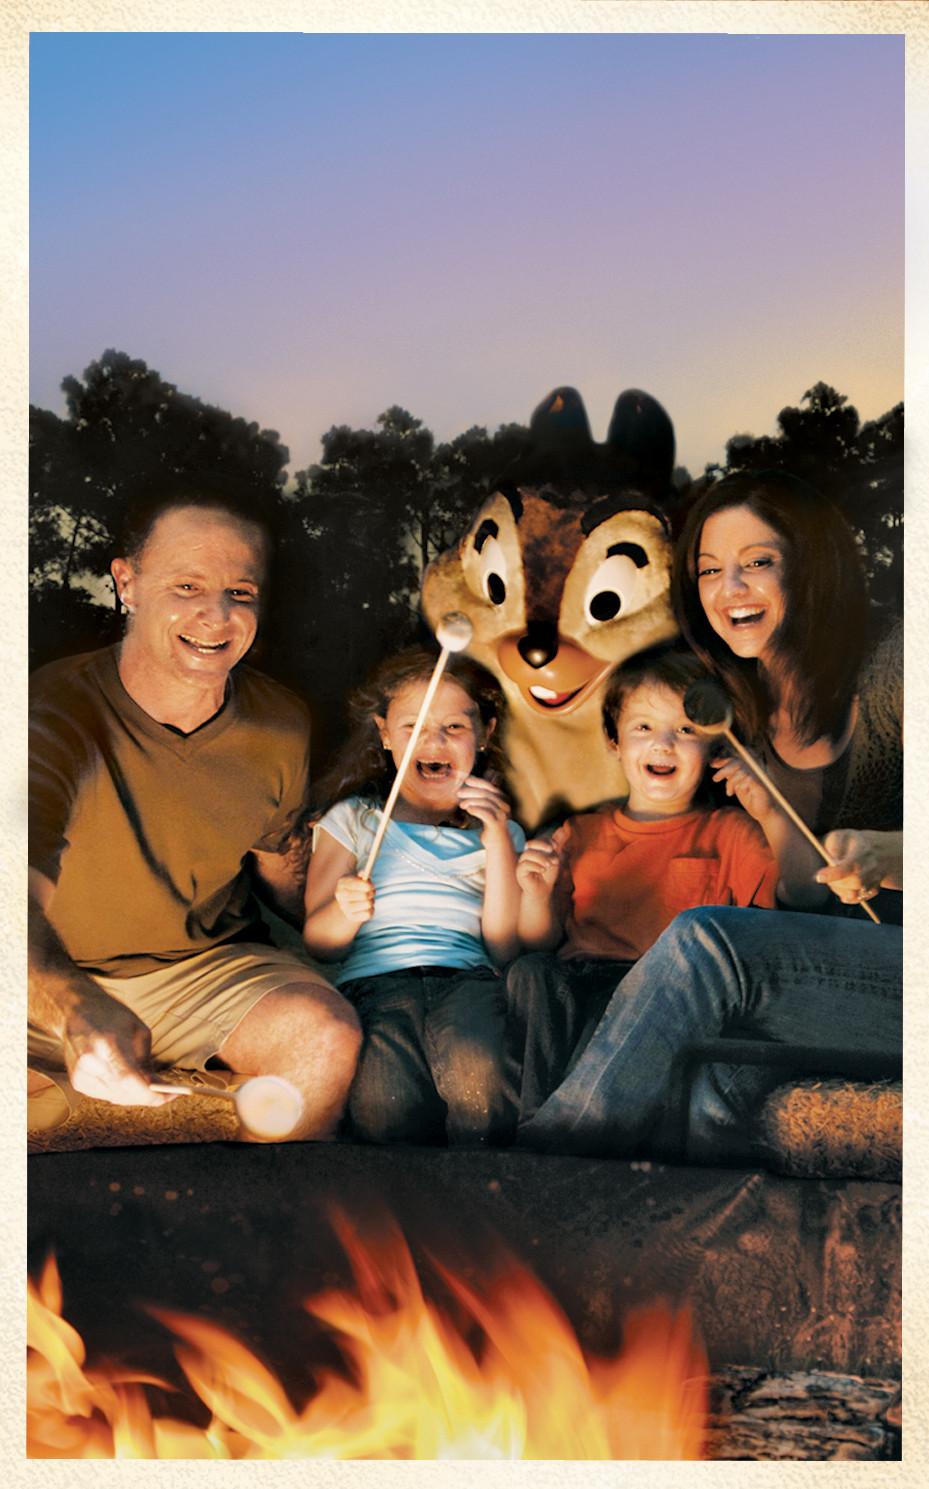 Walt Disney World Campfire at Fort Wilderness Resort